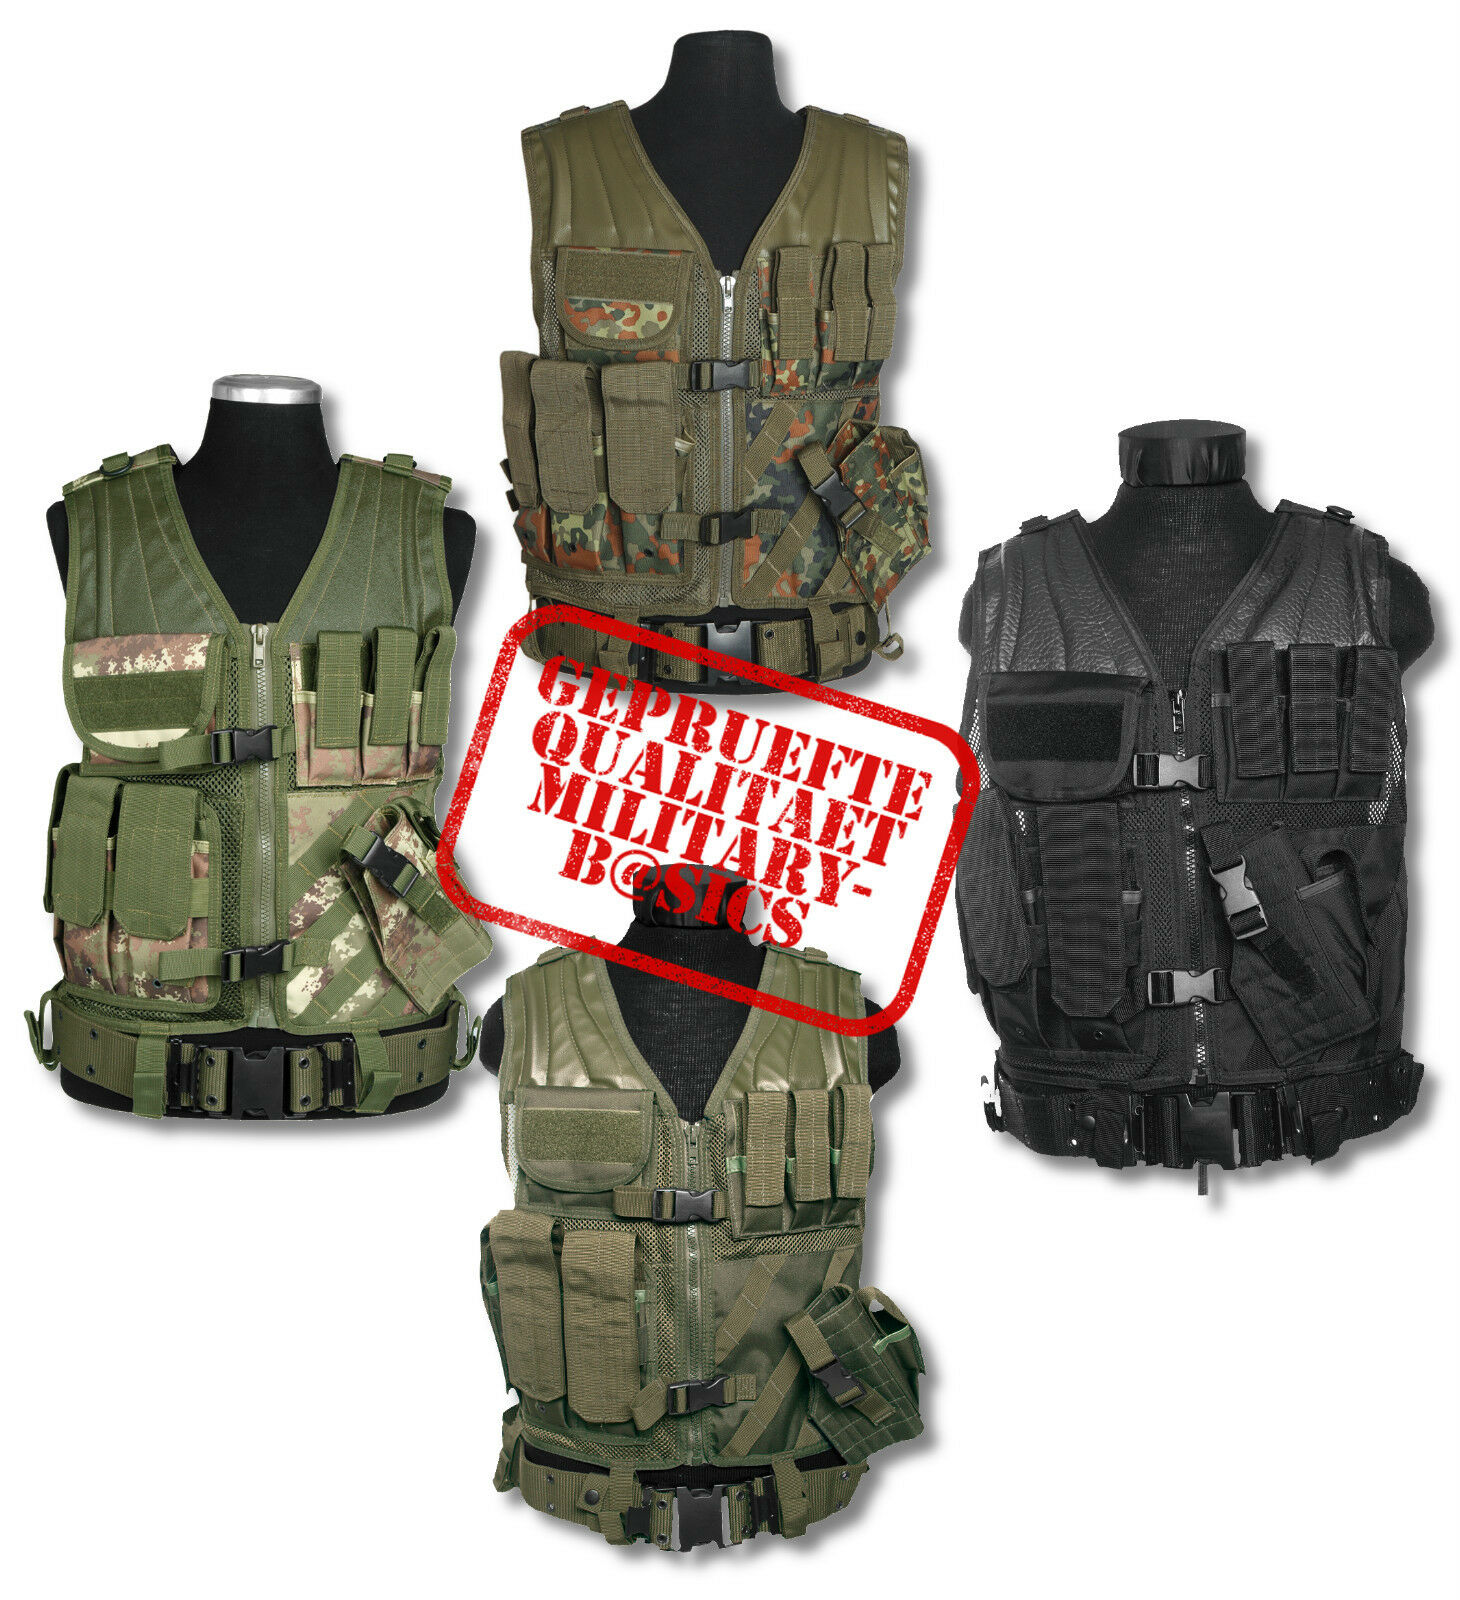 Uso de chaleco taktikweste Tactical  Vest USMC 6 Colors Softair paintball holster  precios ultra bajos